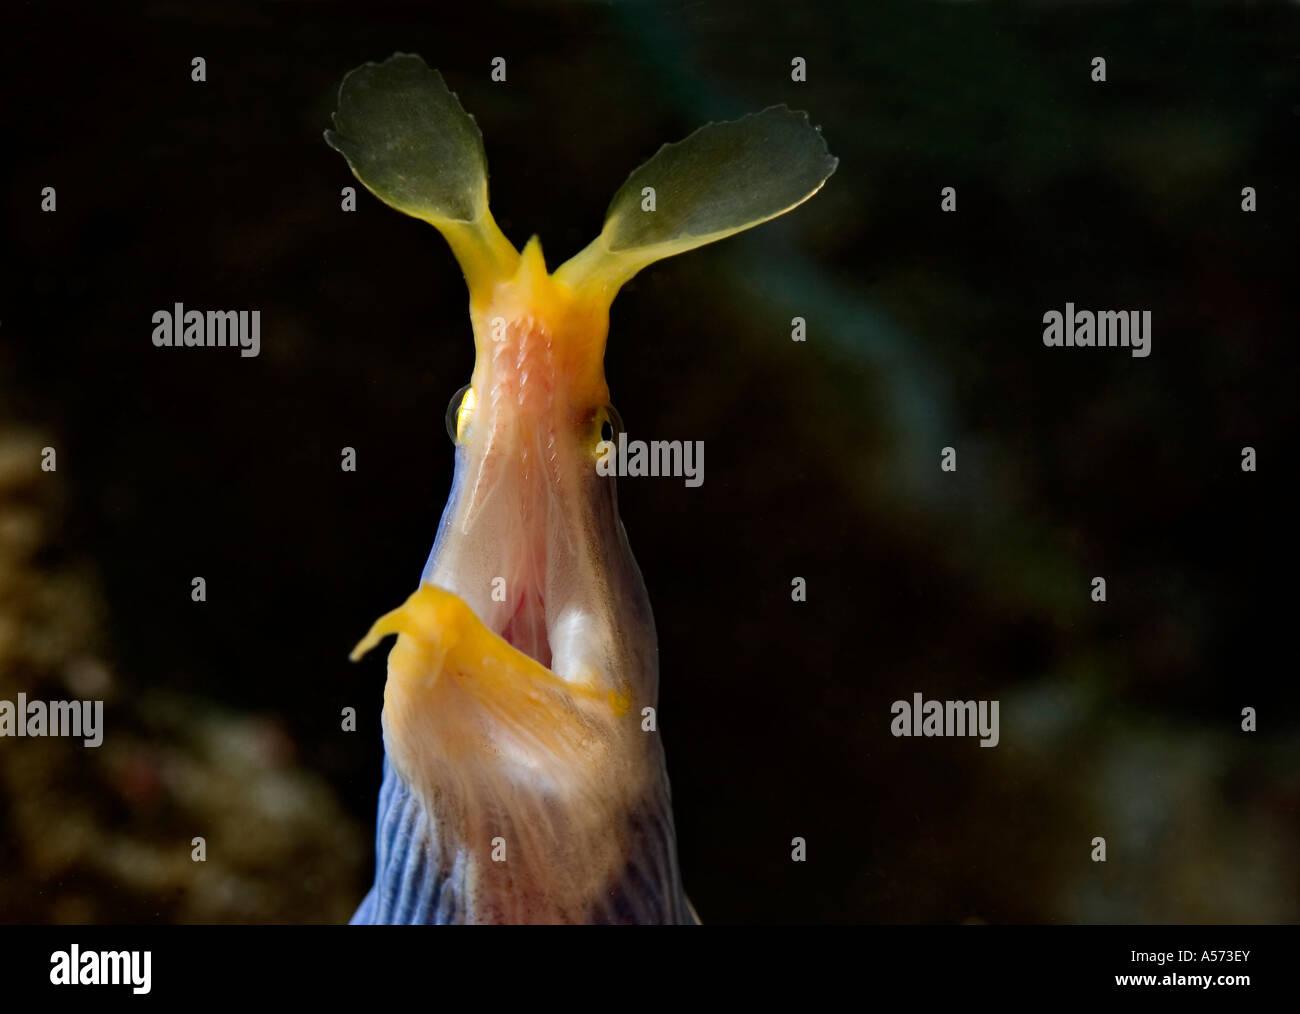 Geistermuraene Ghost Moray Gymnothorax Phasmatodes murene muraene moray morena western indian ocean actinopterygii Stock Photo